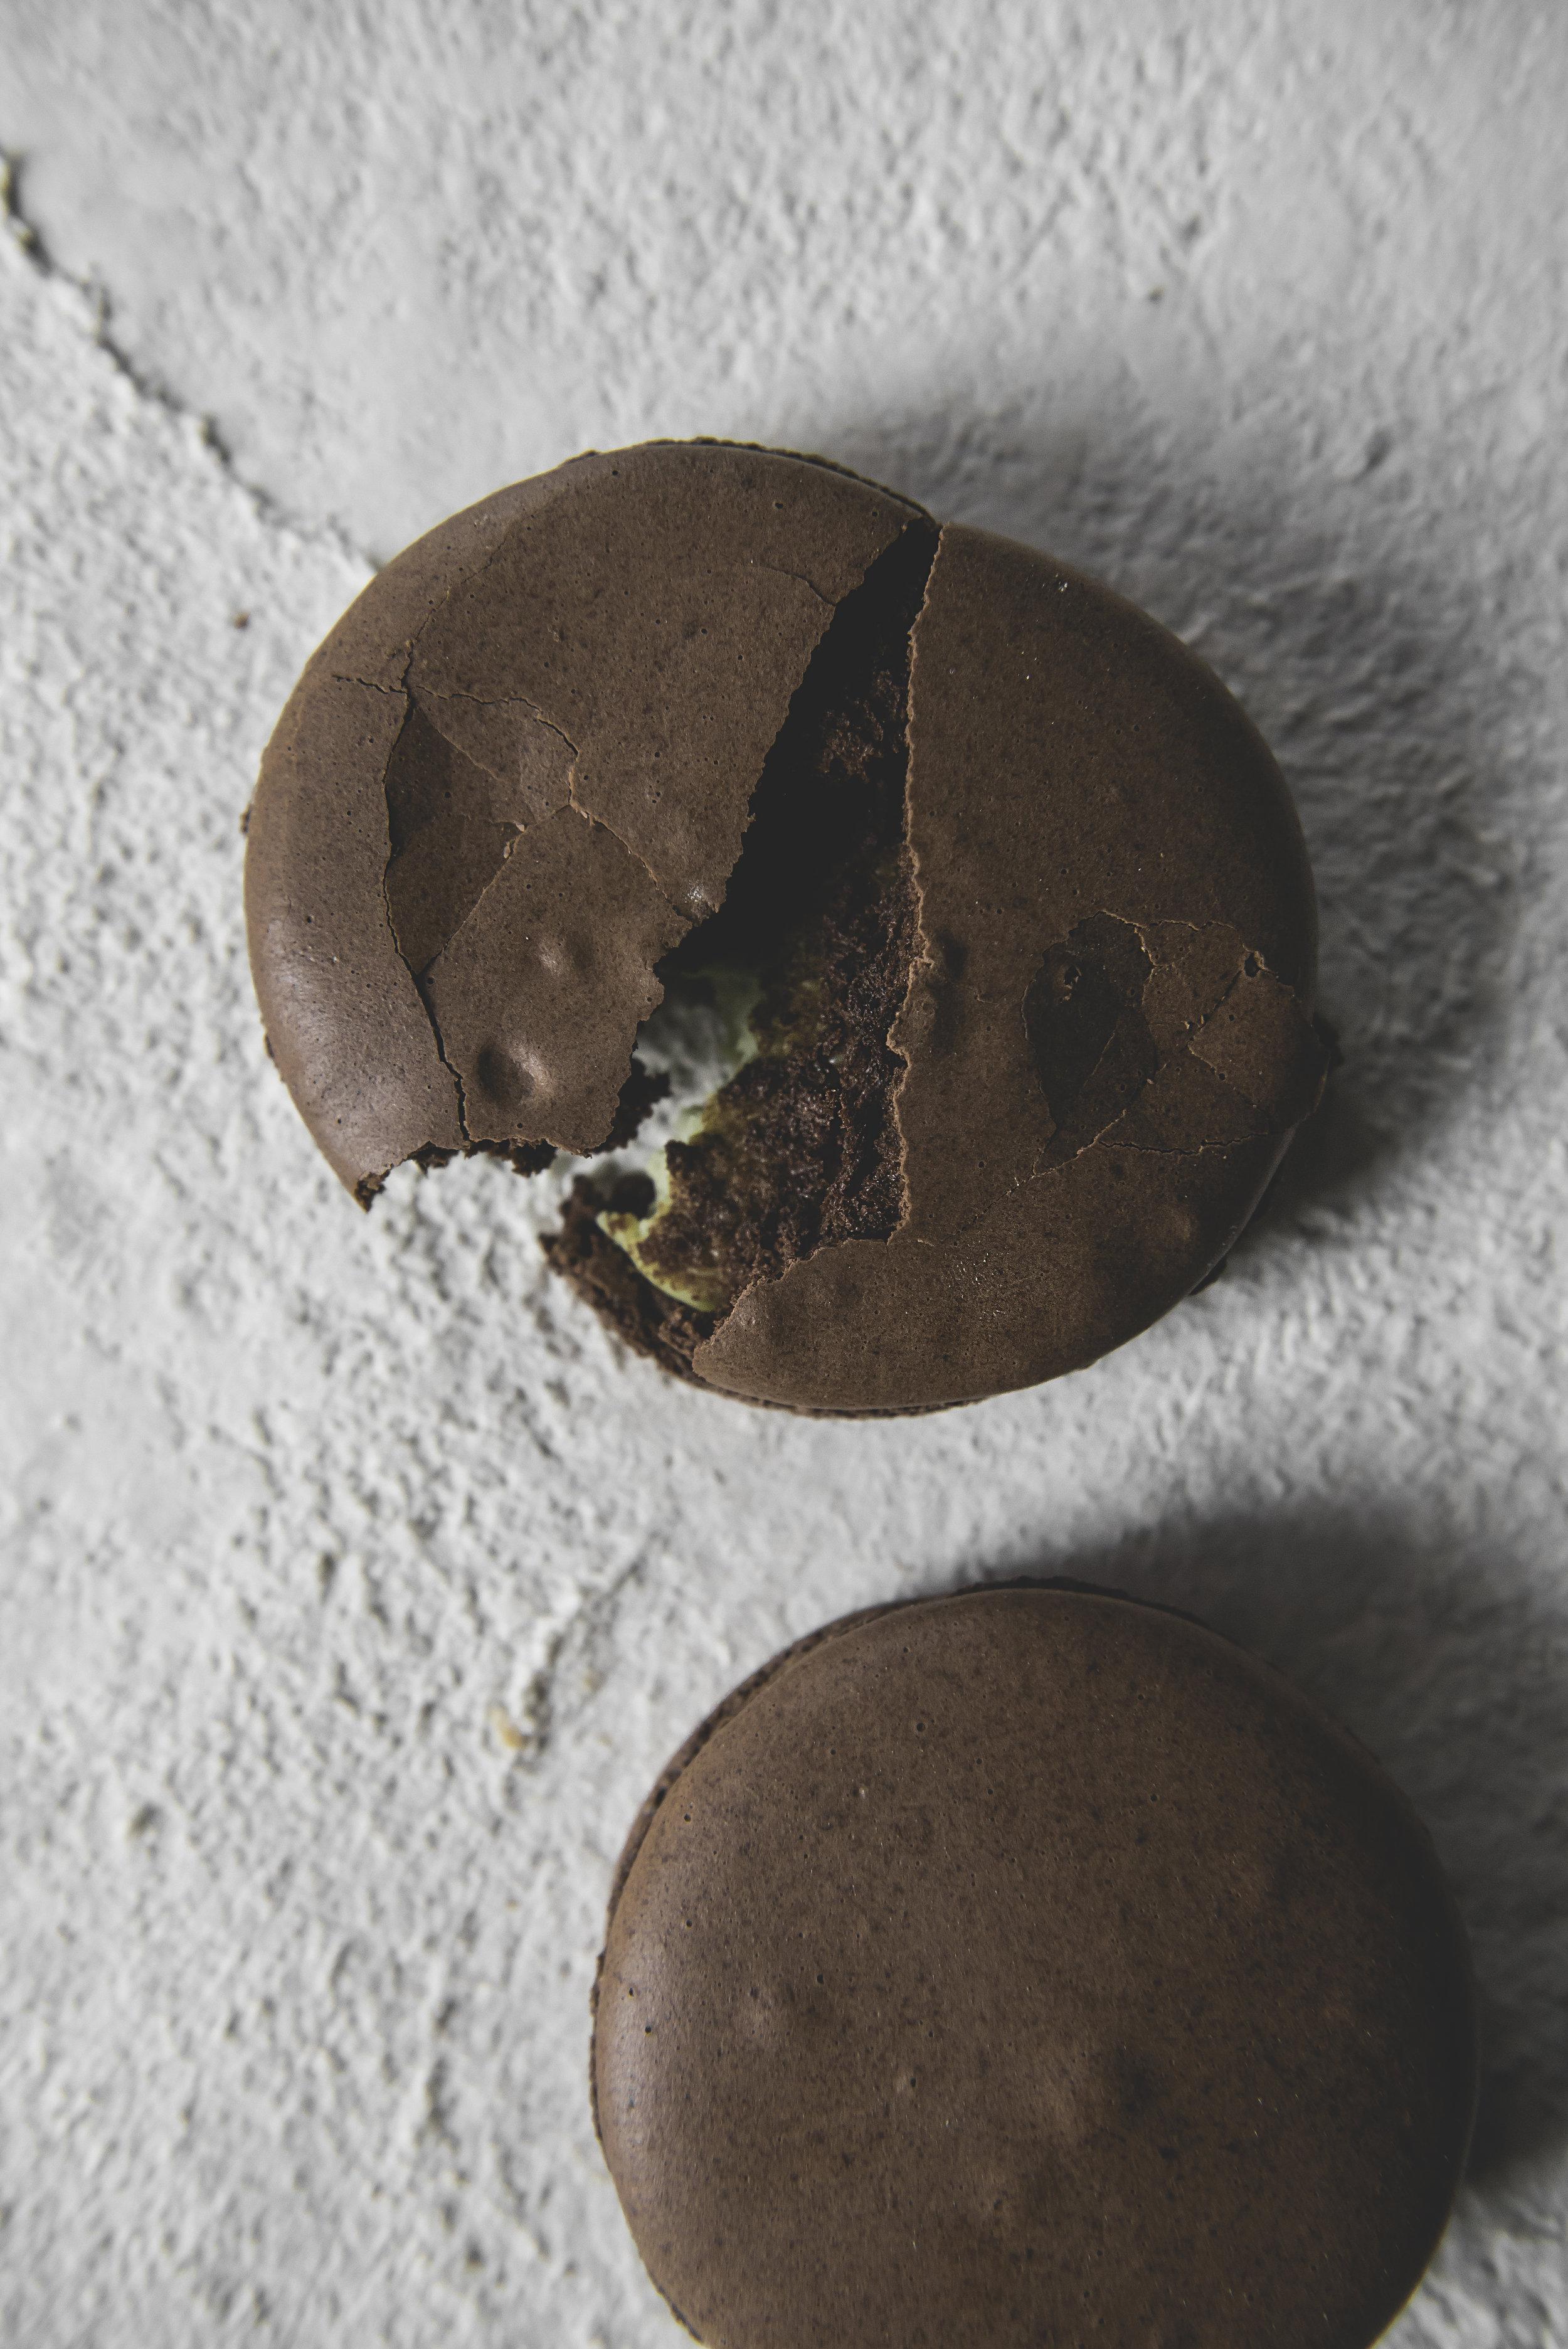 Chocolate Avocado Macaron - Chocolate macaron shell with a white chocolate avocado filling. Pair with a milky macchiato.